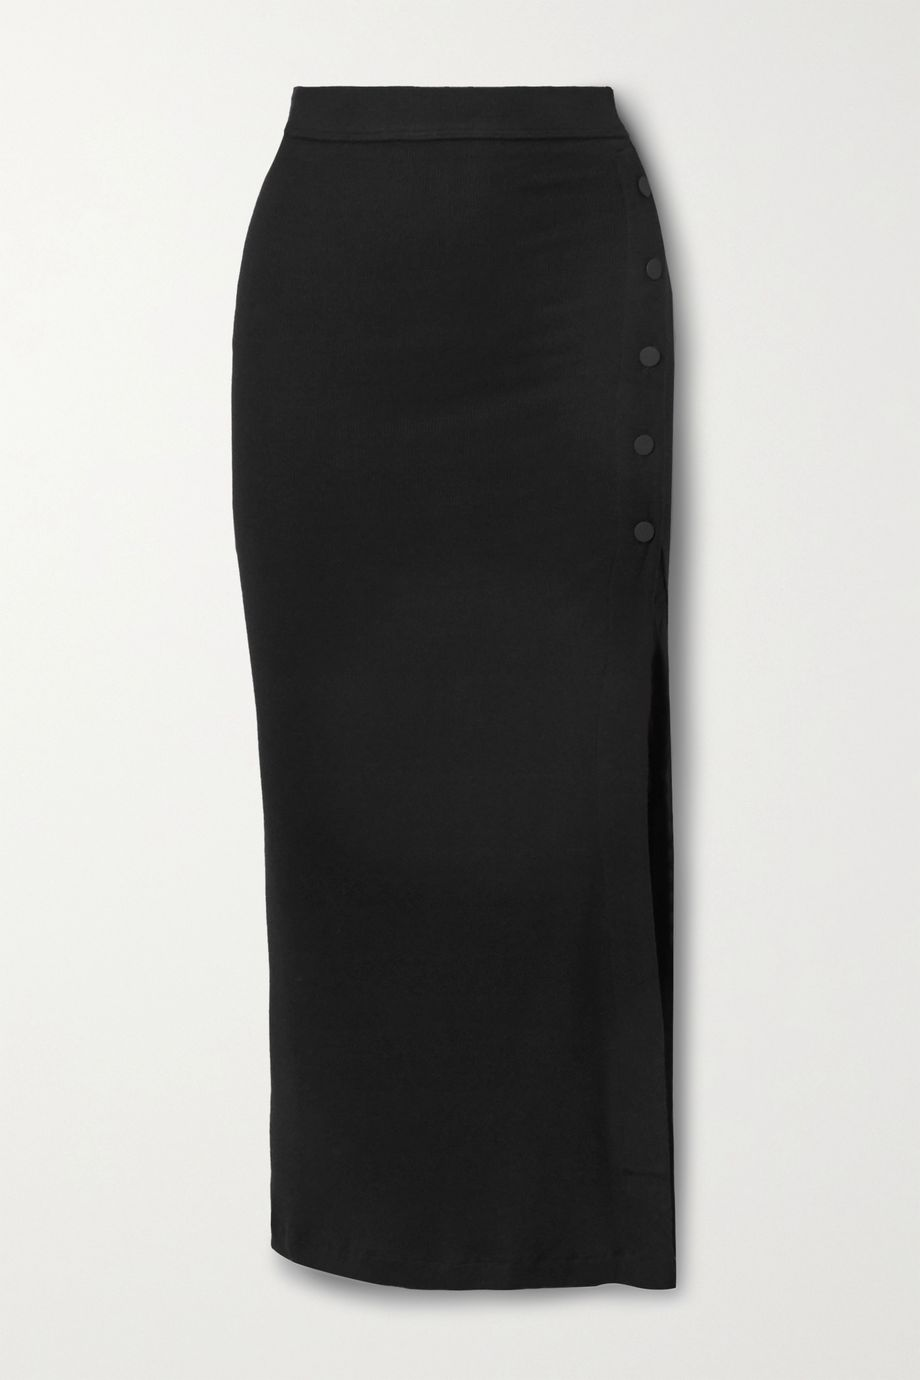 Alix NYC Fordham ribbed stretch-modal jersey midi skirt